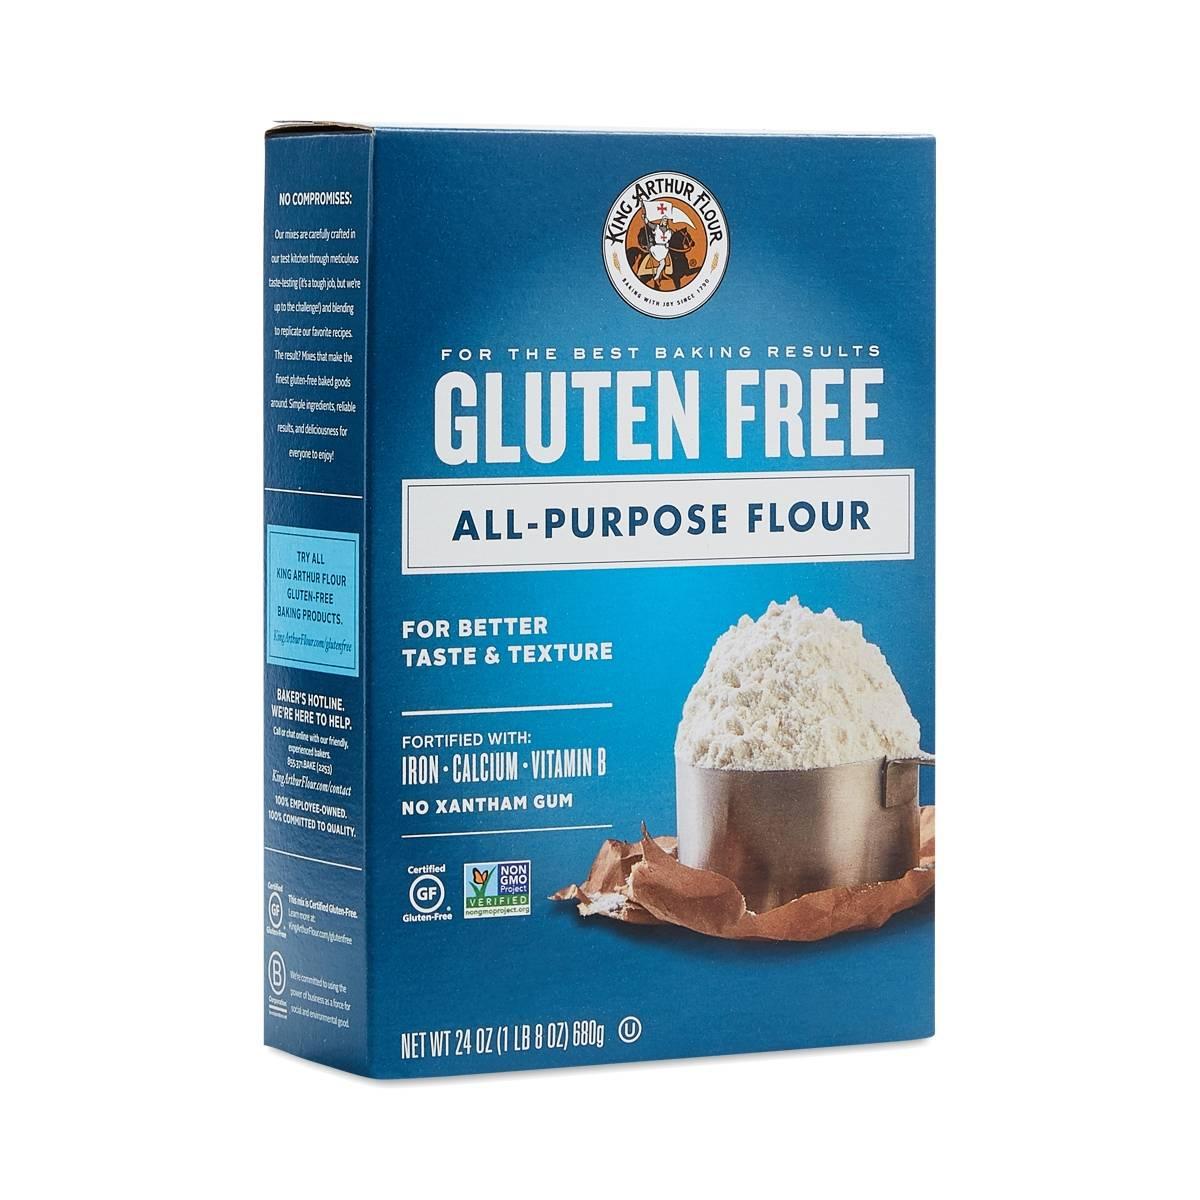 Gluten Free Multi Purpose Flour By King Arthur Flour Thrive Market